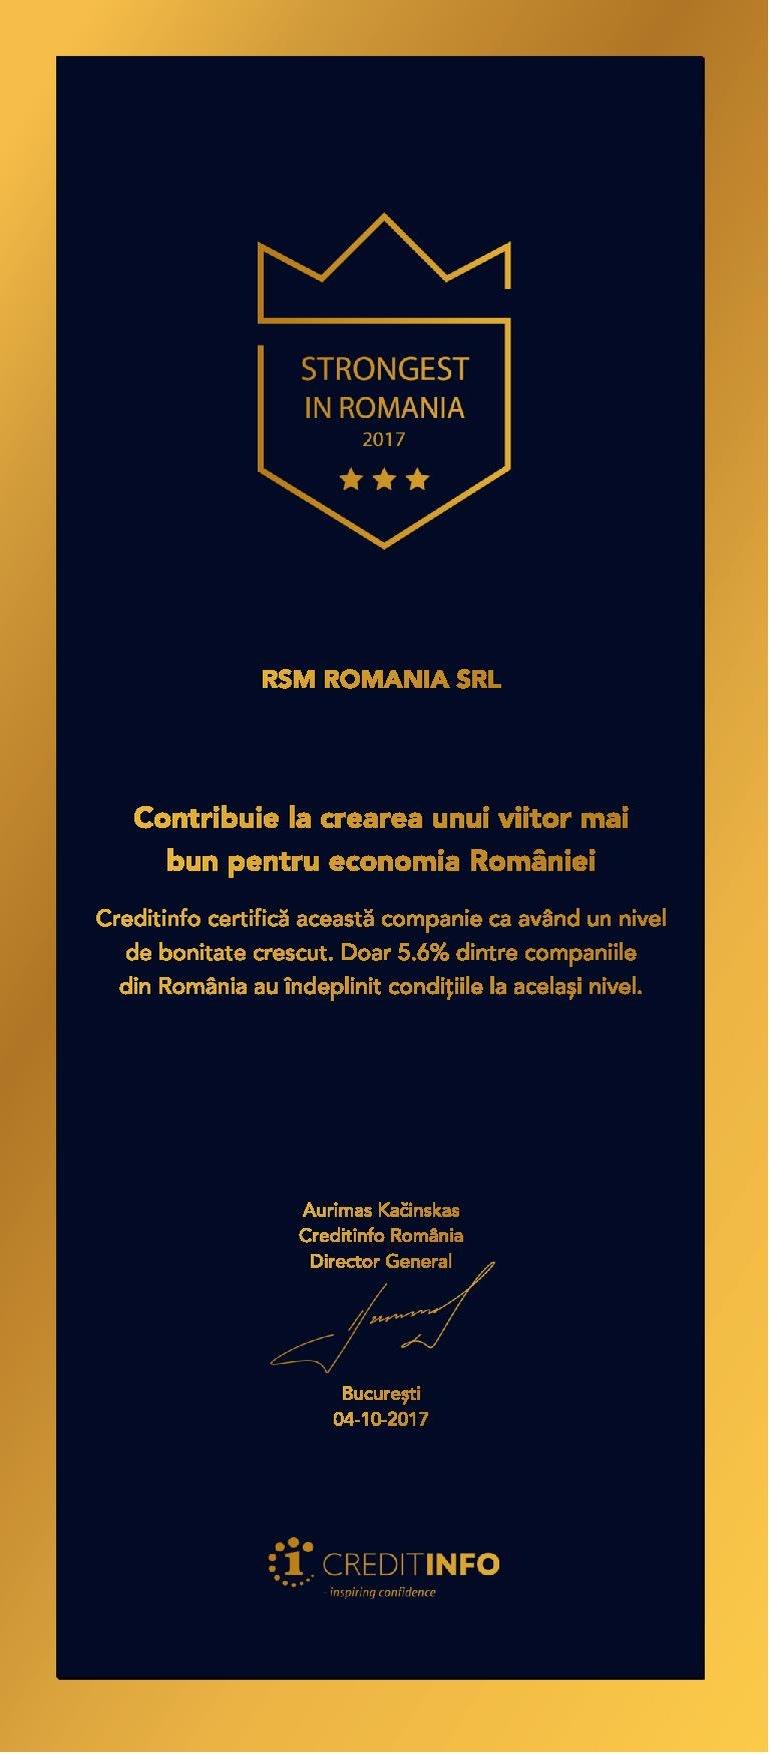 rsm_romania_srl_certificat_ro-page-001.jpg